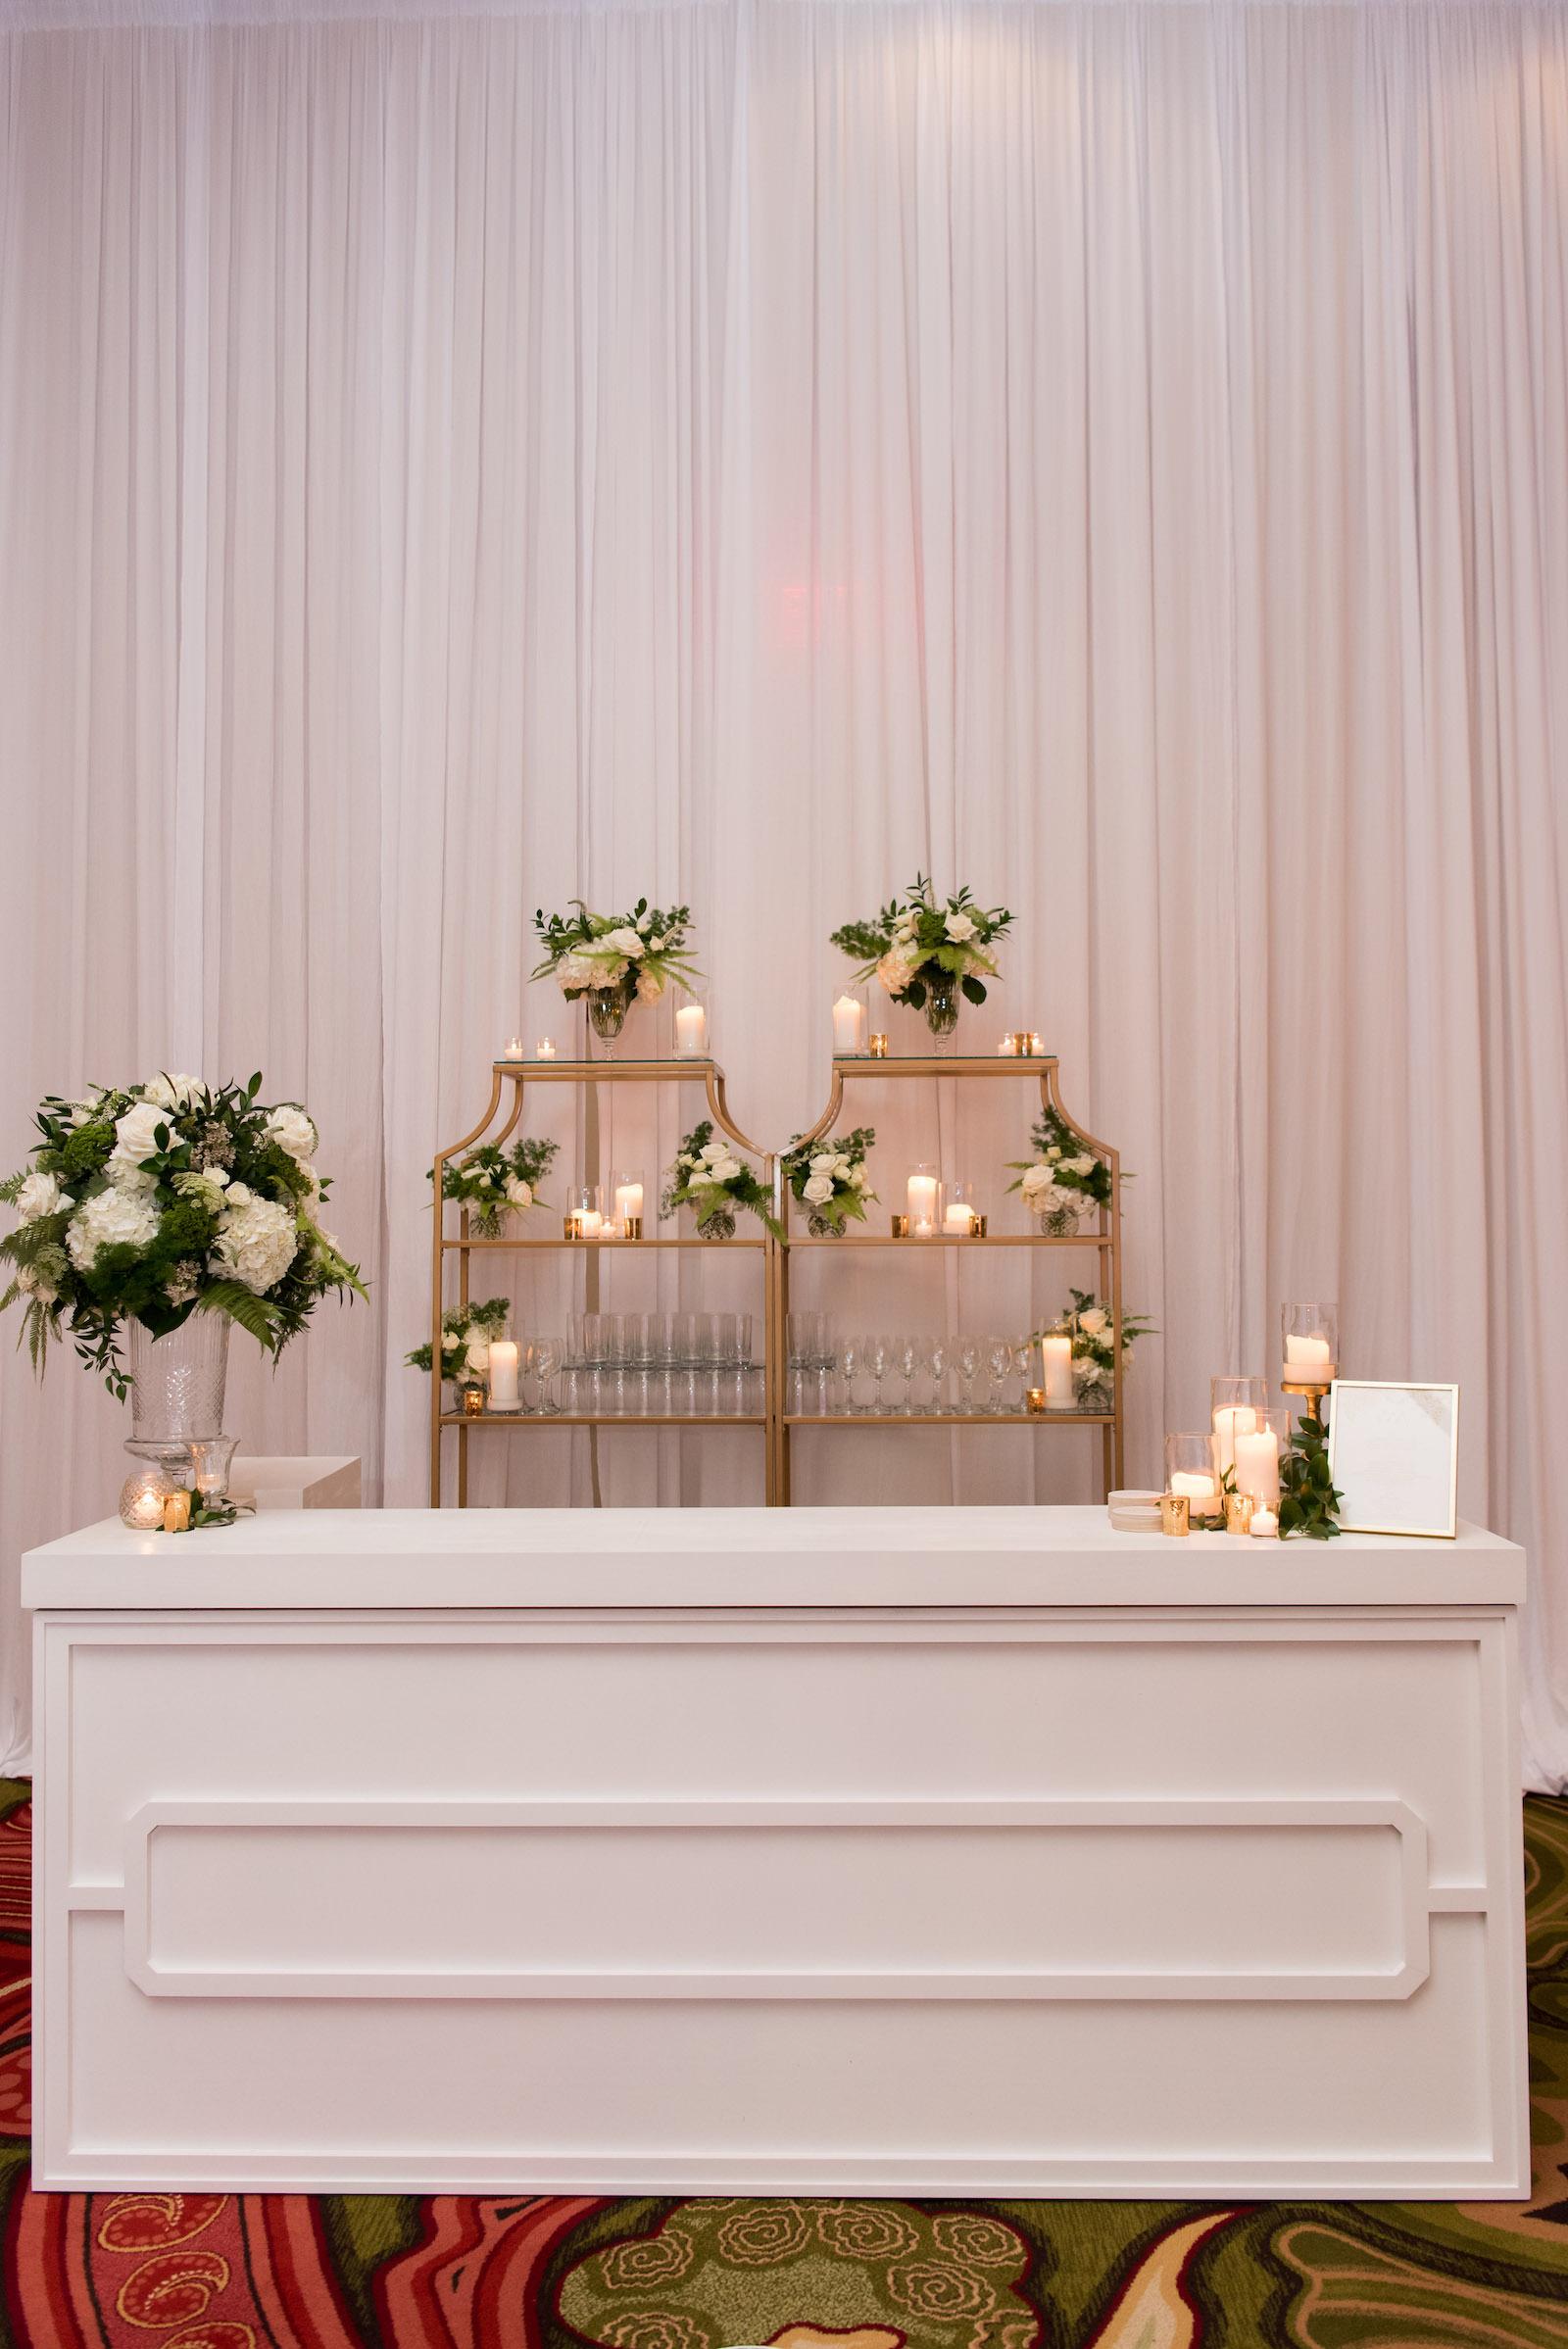 Elegant Wedding Reception Decor, White Bar, Gold Shelves with Greenery and White Florals | Tampa Bay Wedding Planner Parties A'la Carte | St Pete Wedding Venue The Vinoy | Wedding Rentals A Chair Affair | Wedding Florist Bruce Wayne Florals